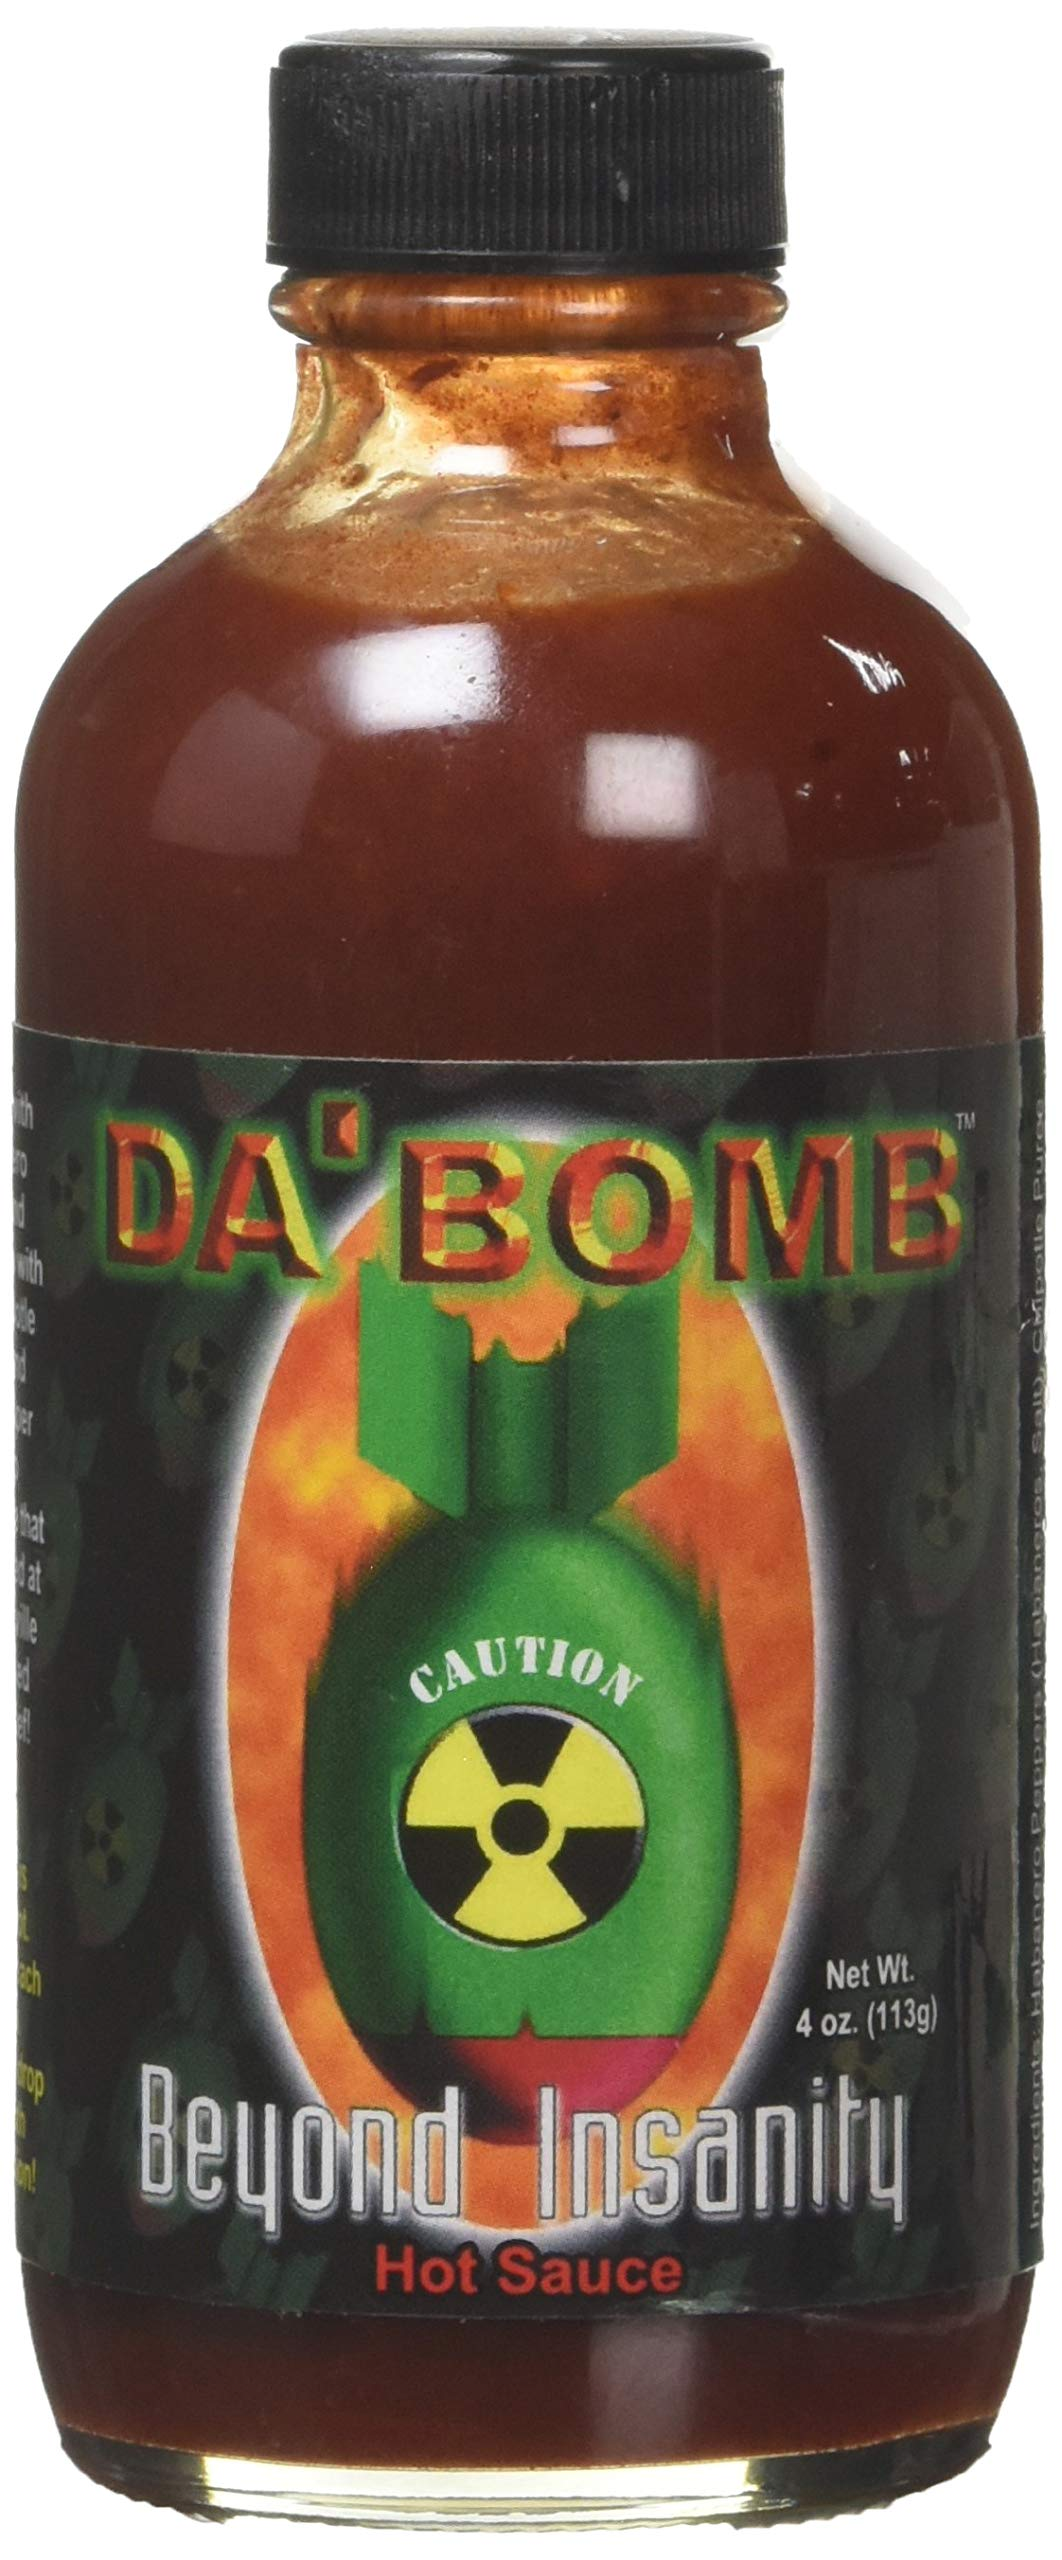 Americanspice Da Bomb Beyond Insanity Hot Sauce, Bottle, 4 Fl Oz